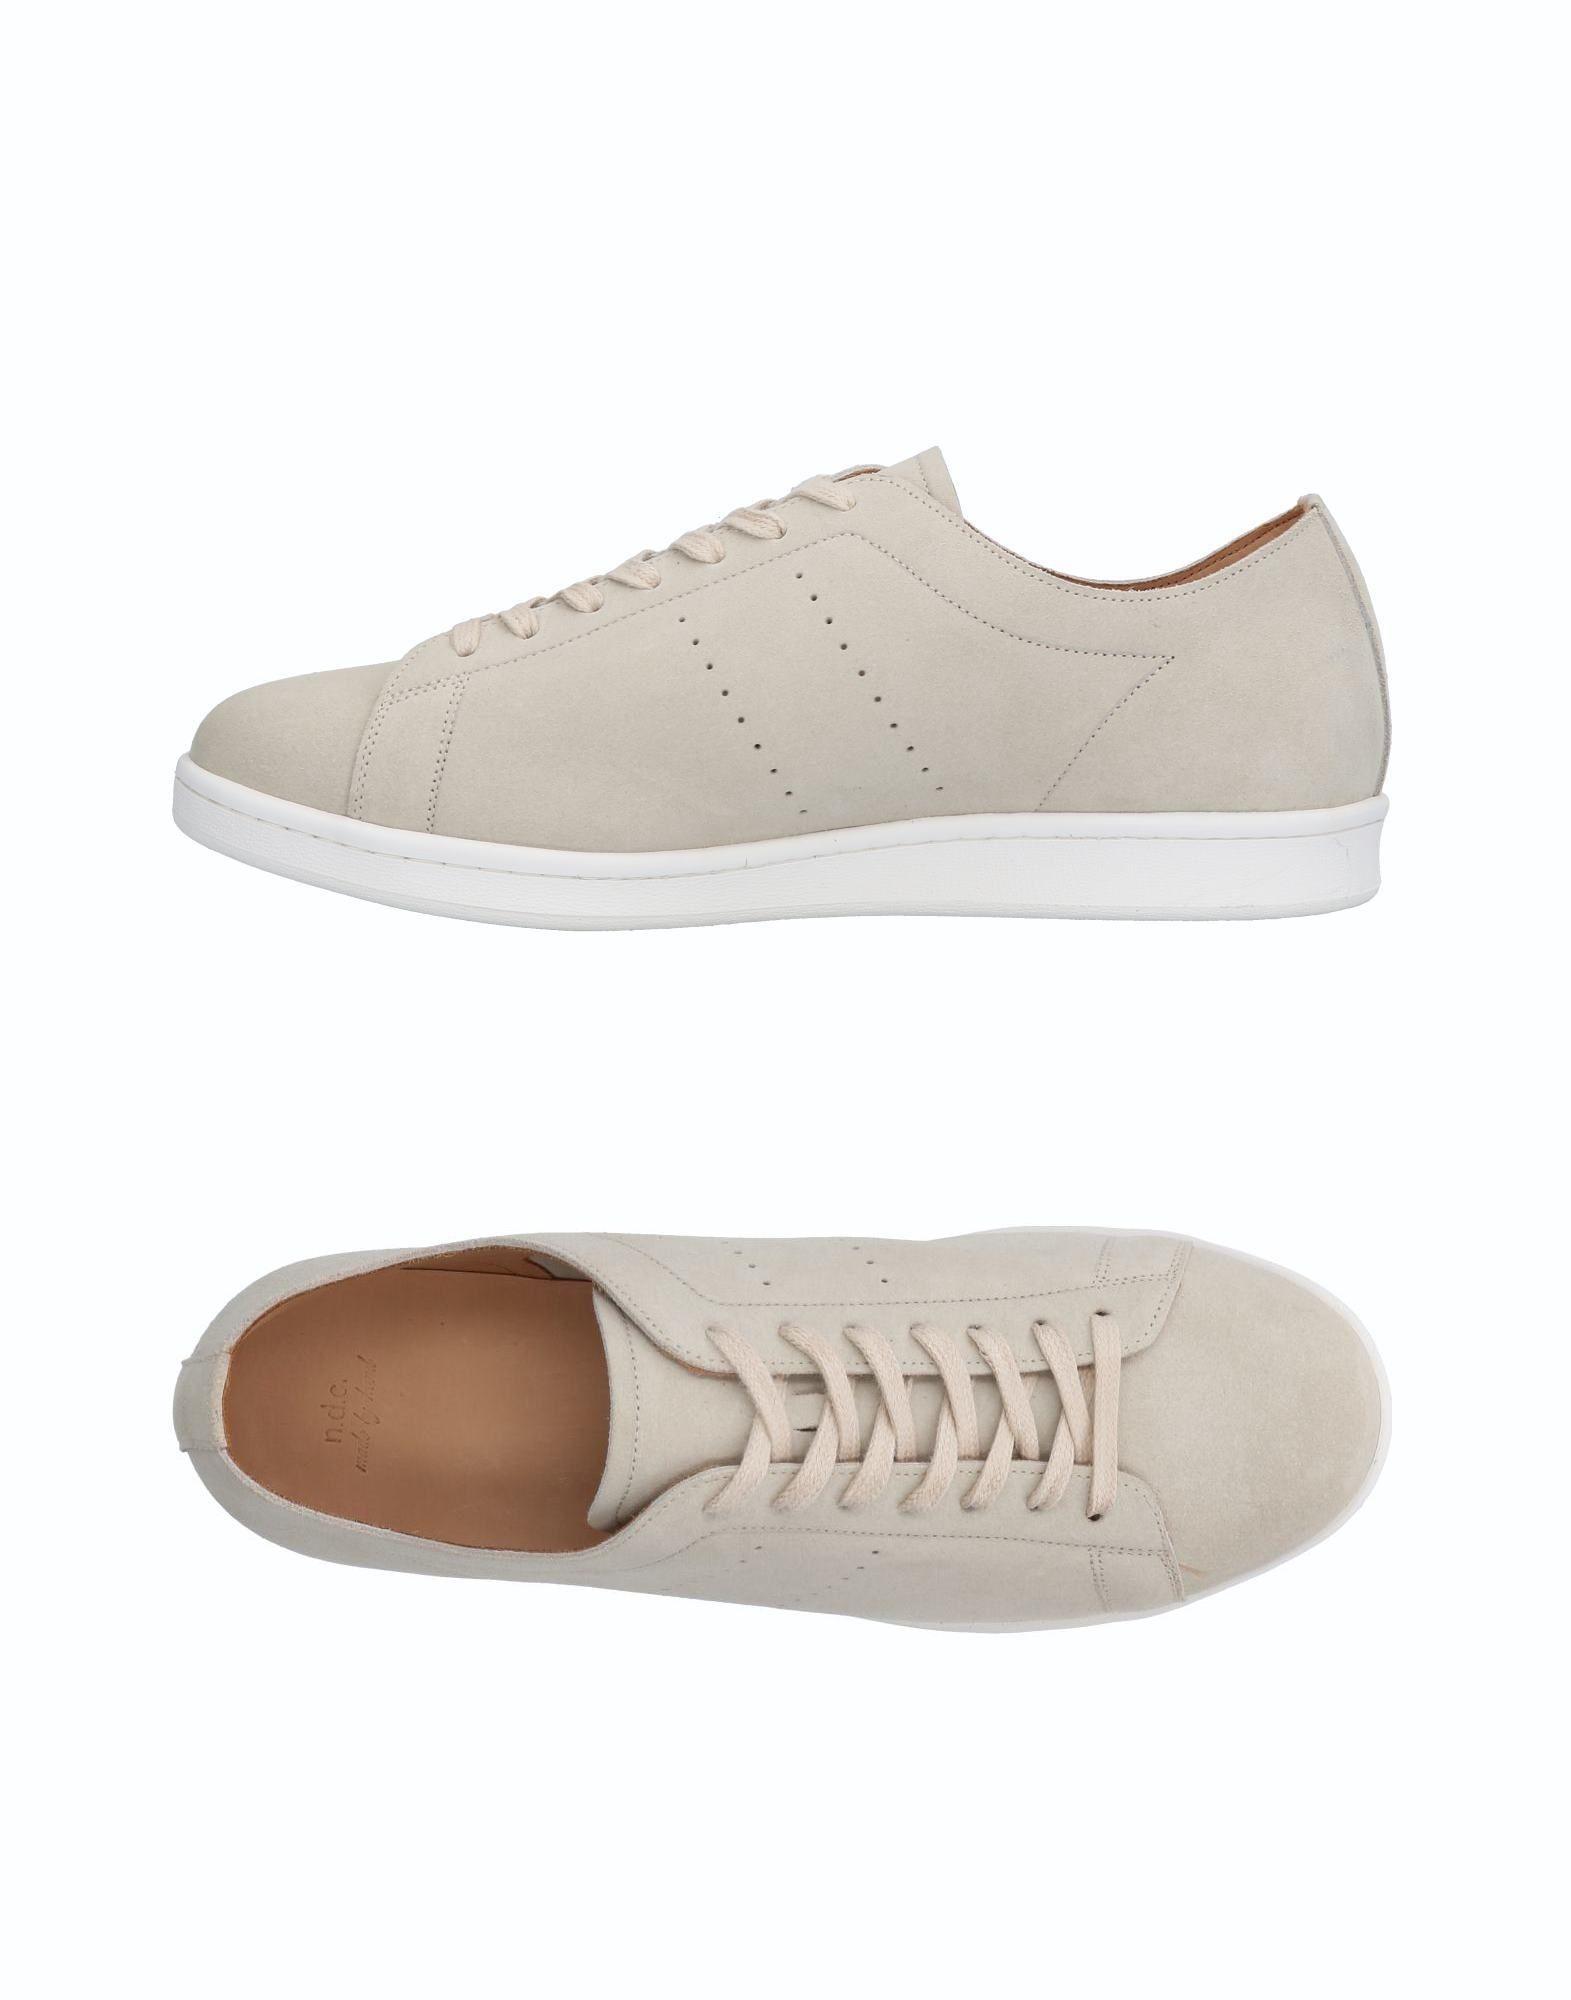 N.D.C. Made By Hand Sneakers Herren  11514134WE Gute Qualität beliebte Schuhe